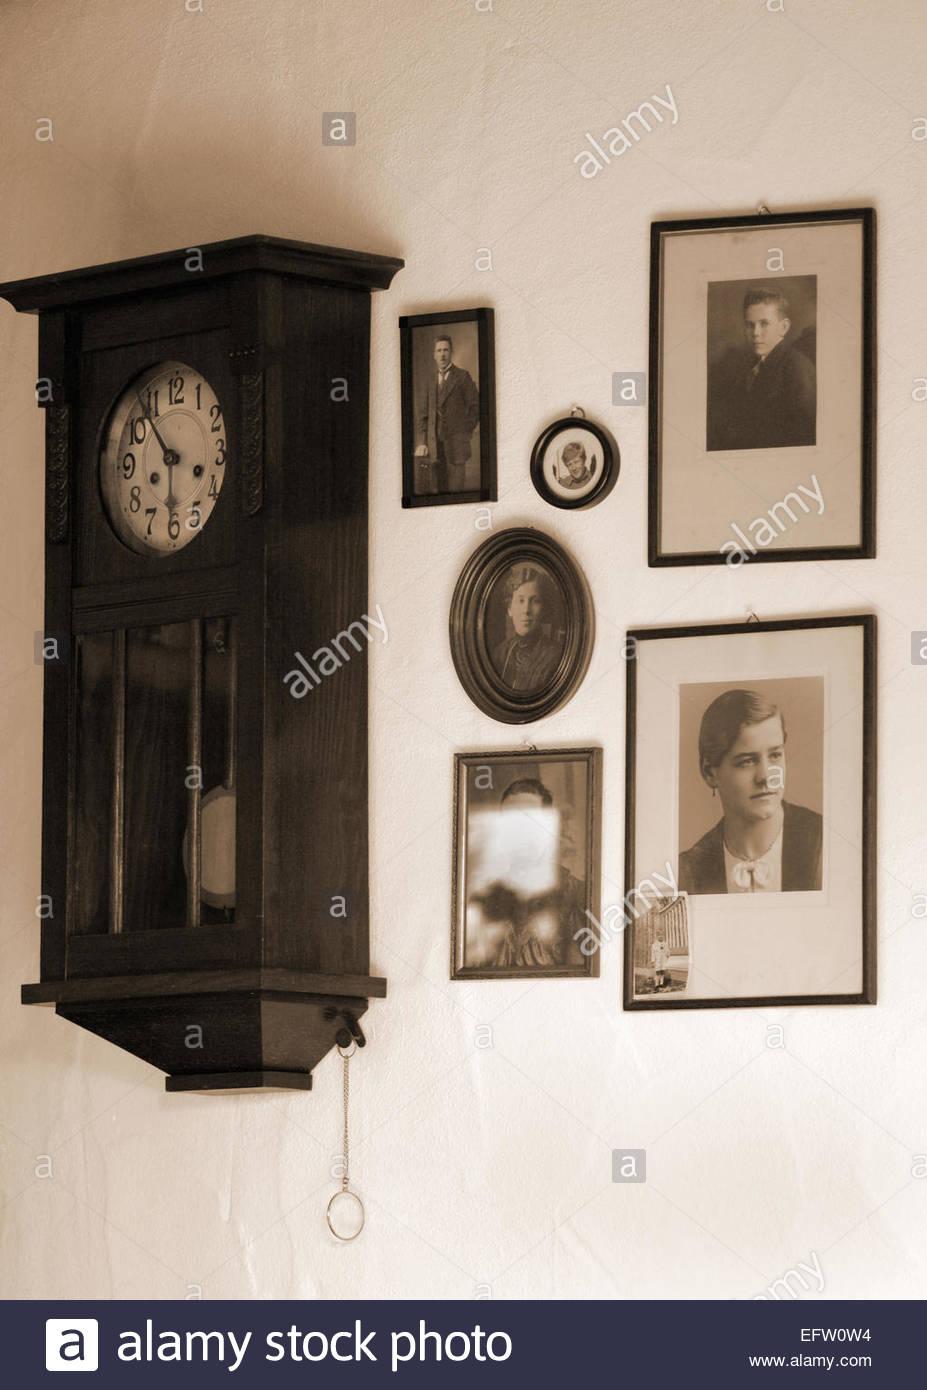 Grandfather Clock Nobody Stockfotos & Grandfather Clock Nobody ...